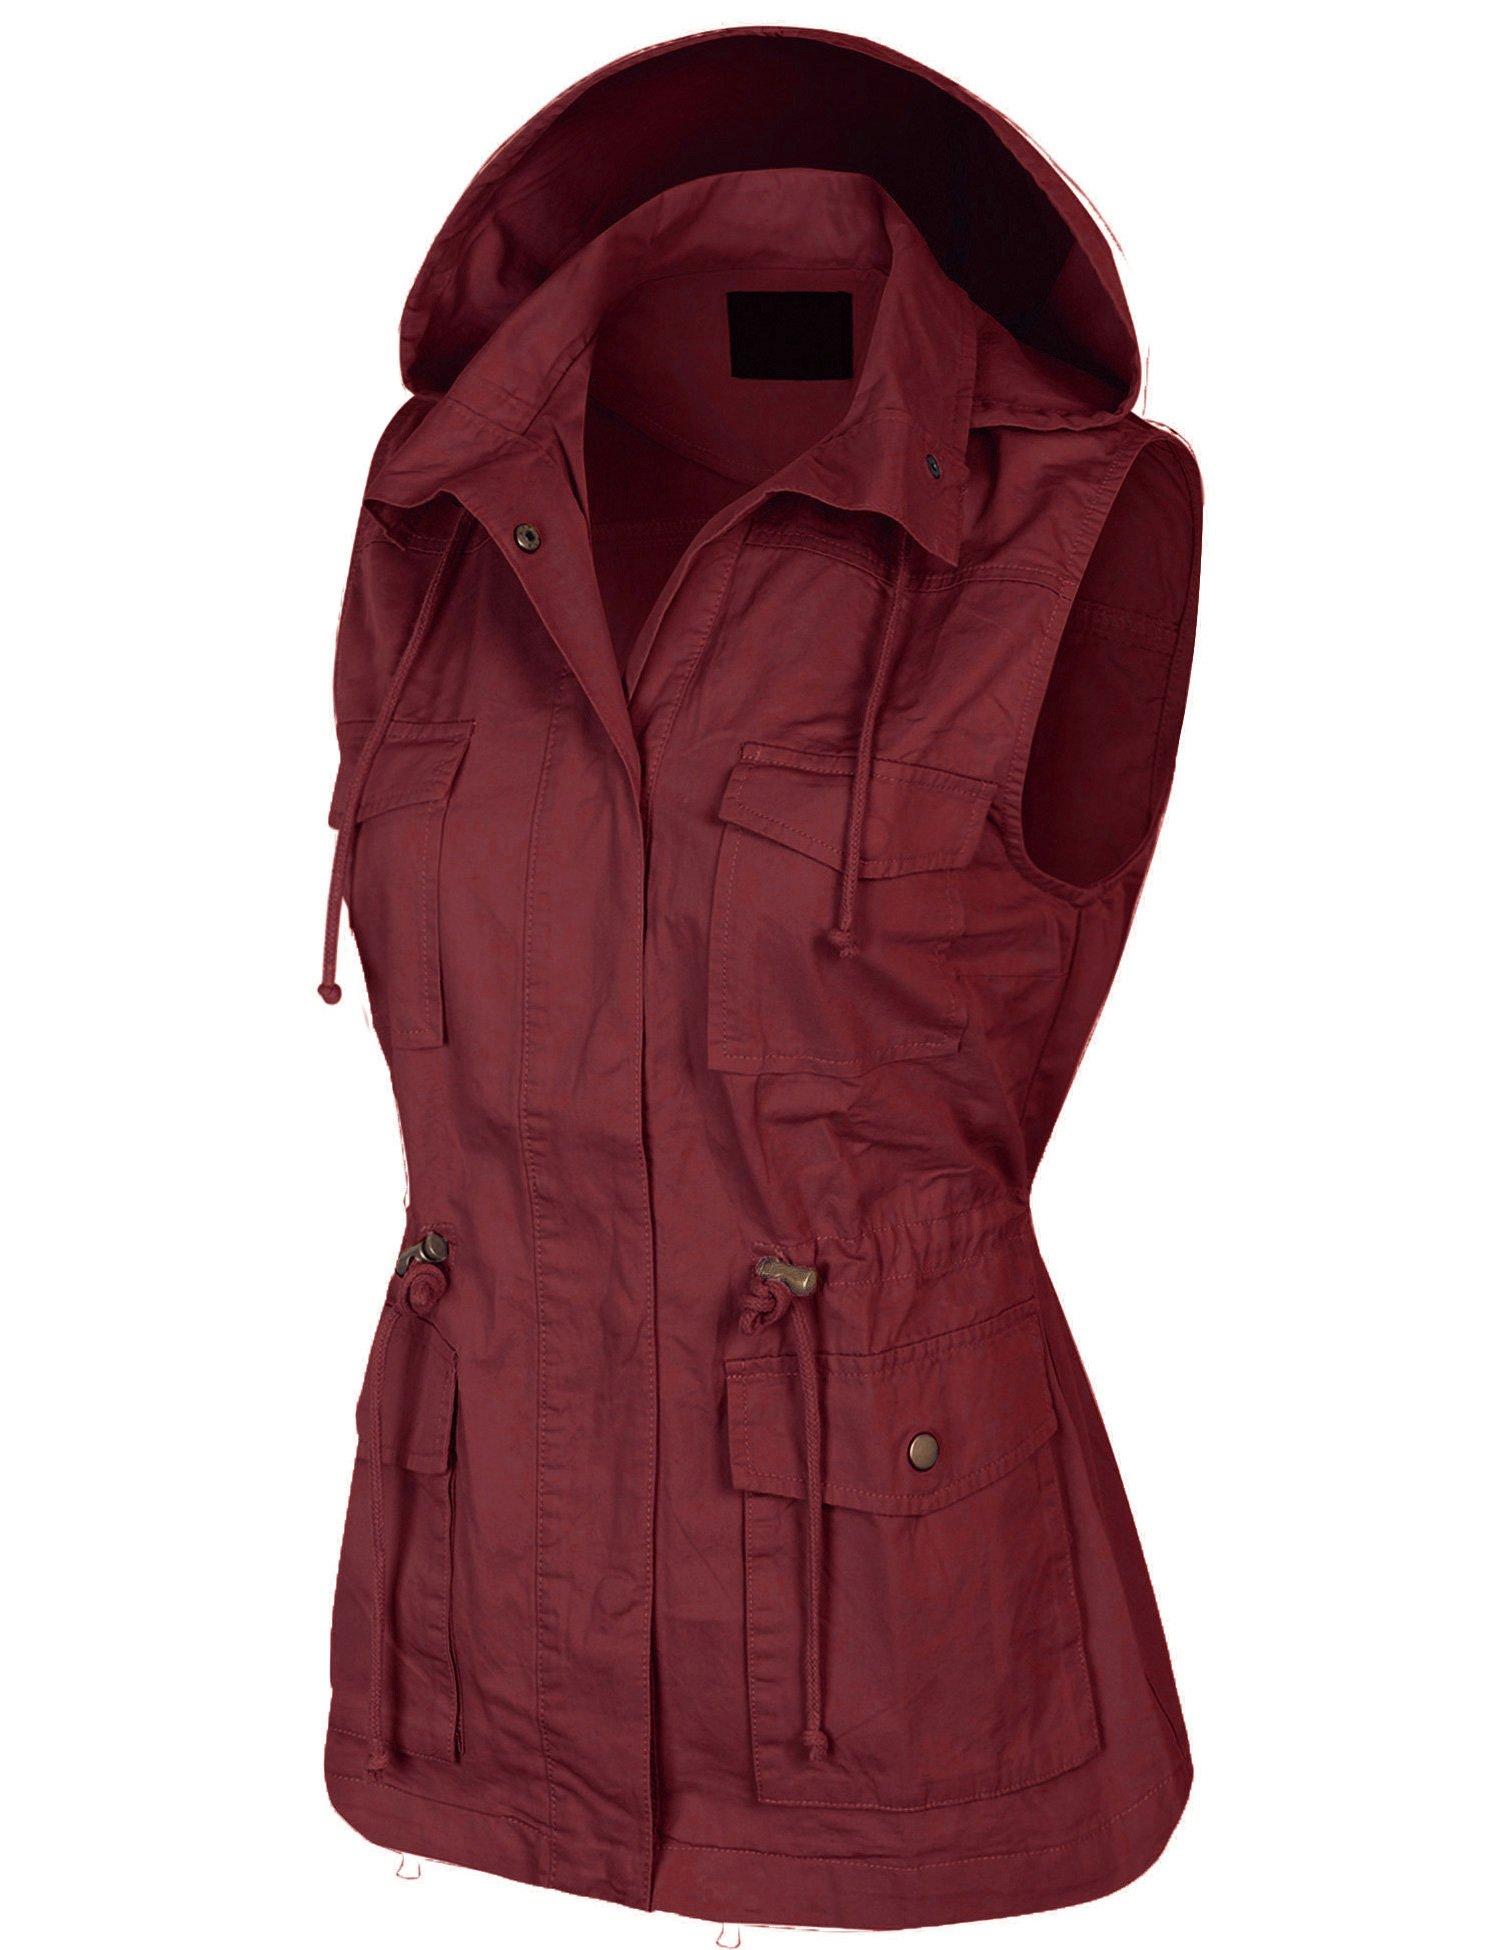 KOGMO Womens Military Anorak Safari Utility Vest with Hood-3X-WINE by KOGMO (Image #2)